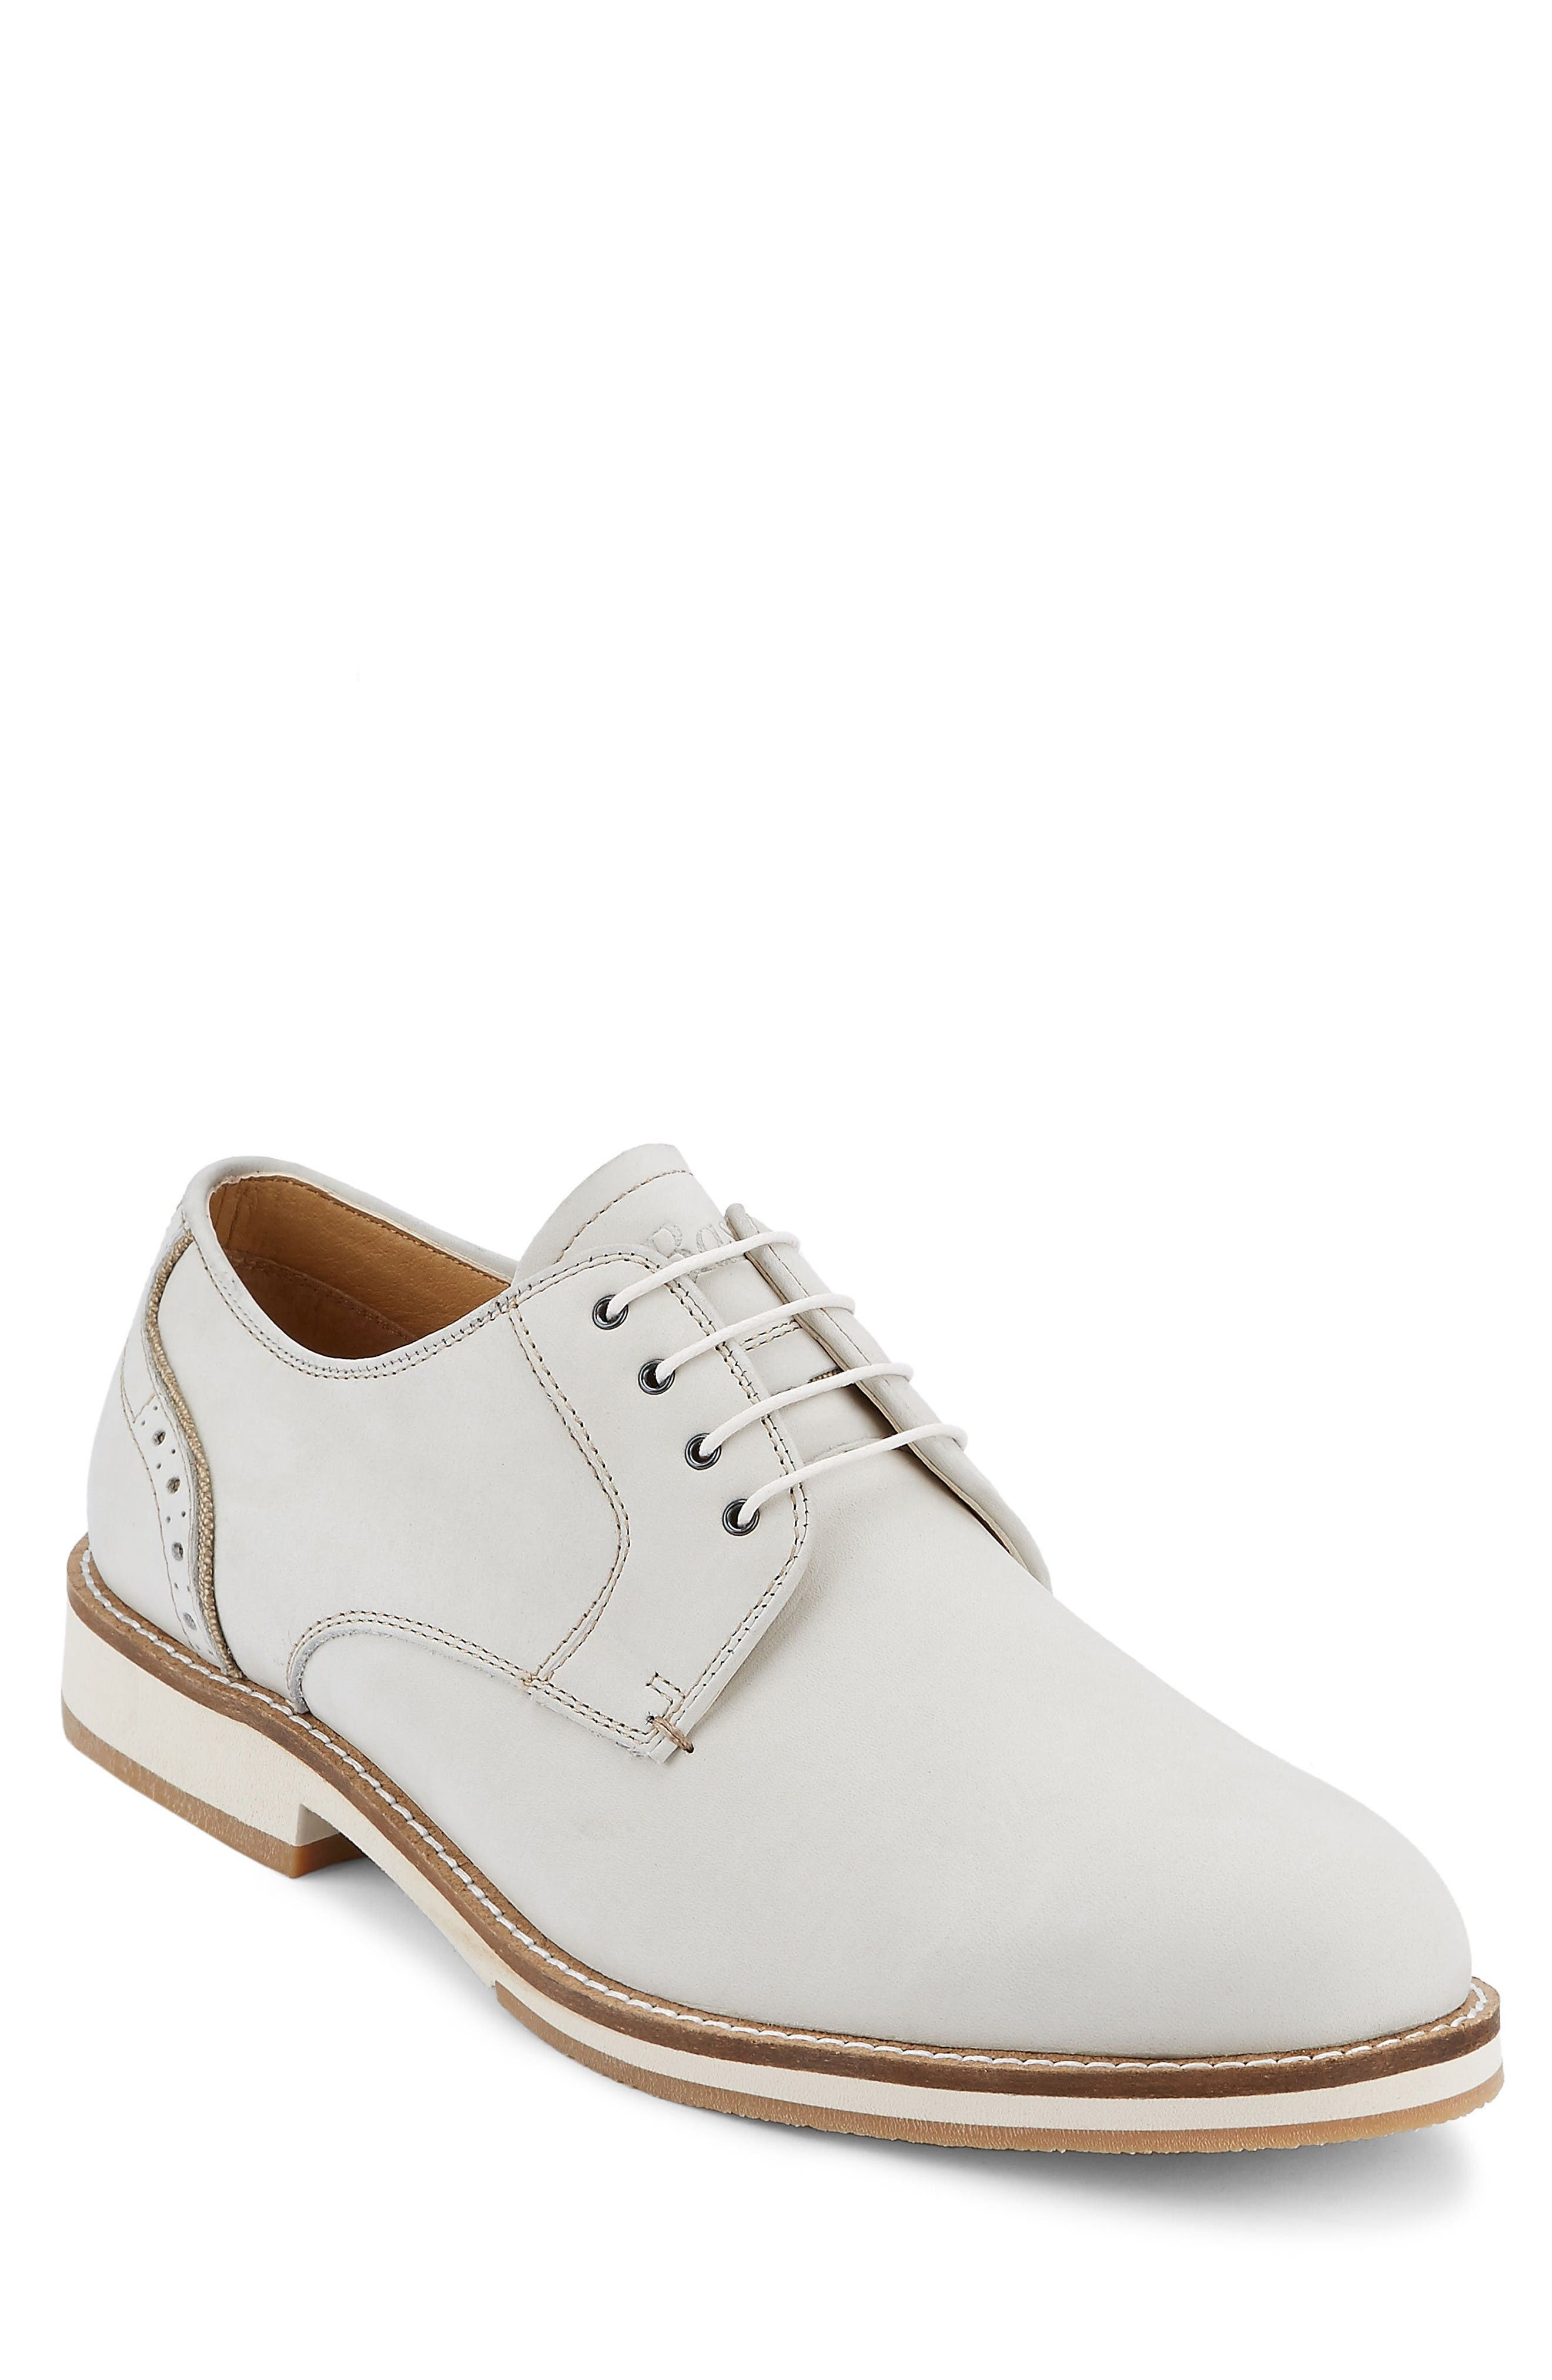 G.H Bass & Co. Niles Plain Toe Derby (Men)